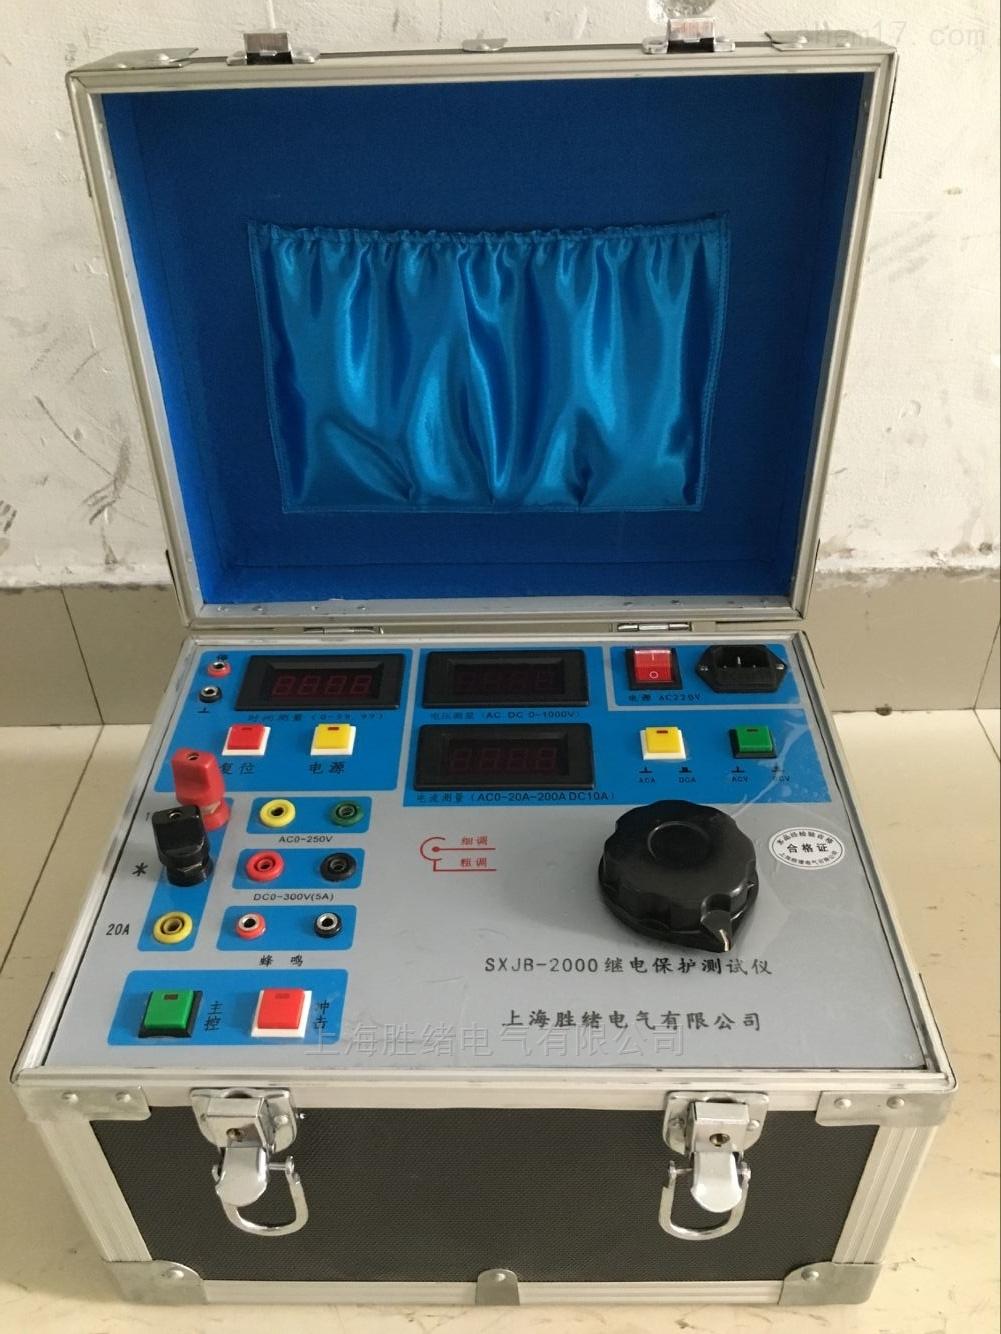 SXJB-3300微机继电保护校验仪